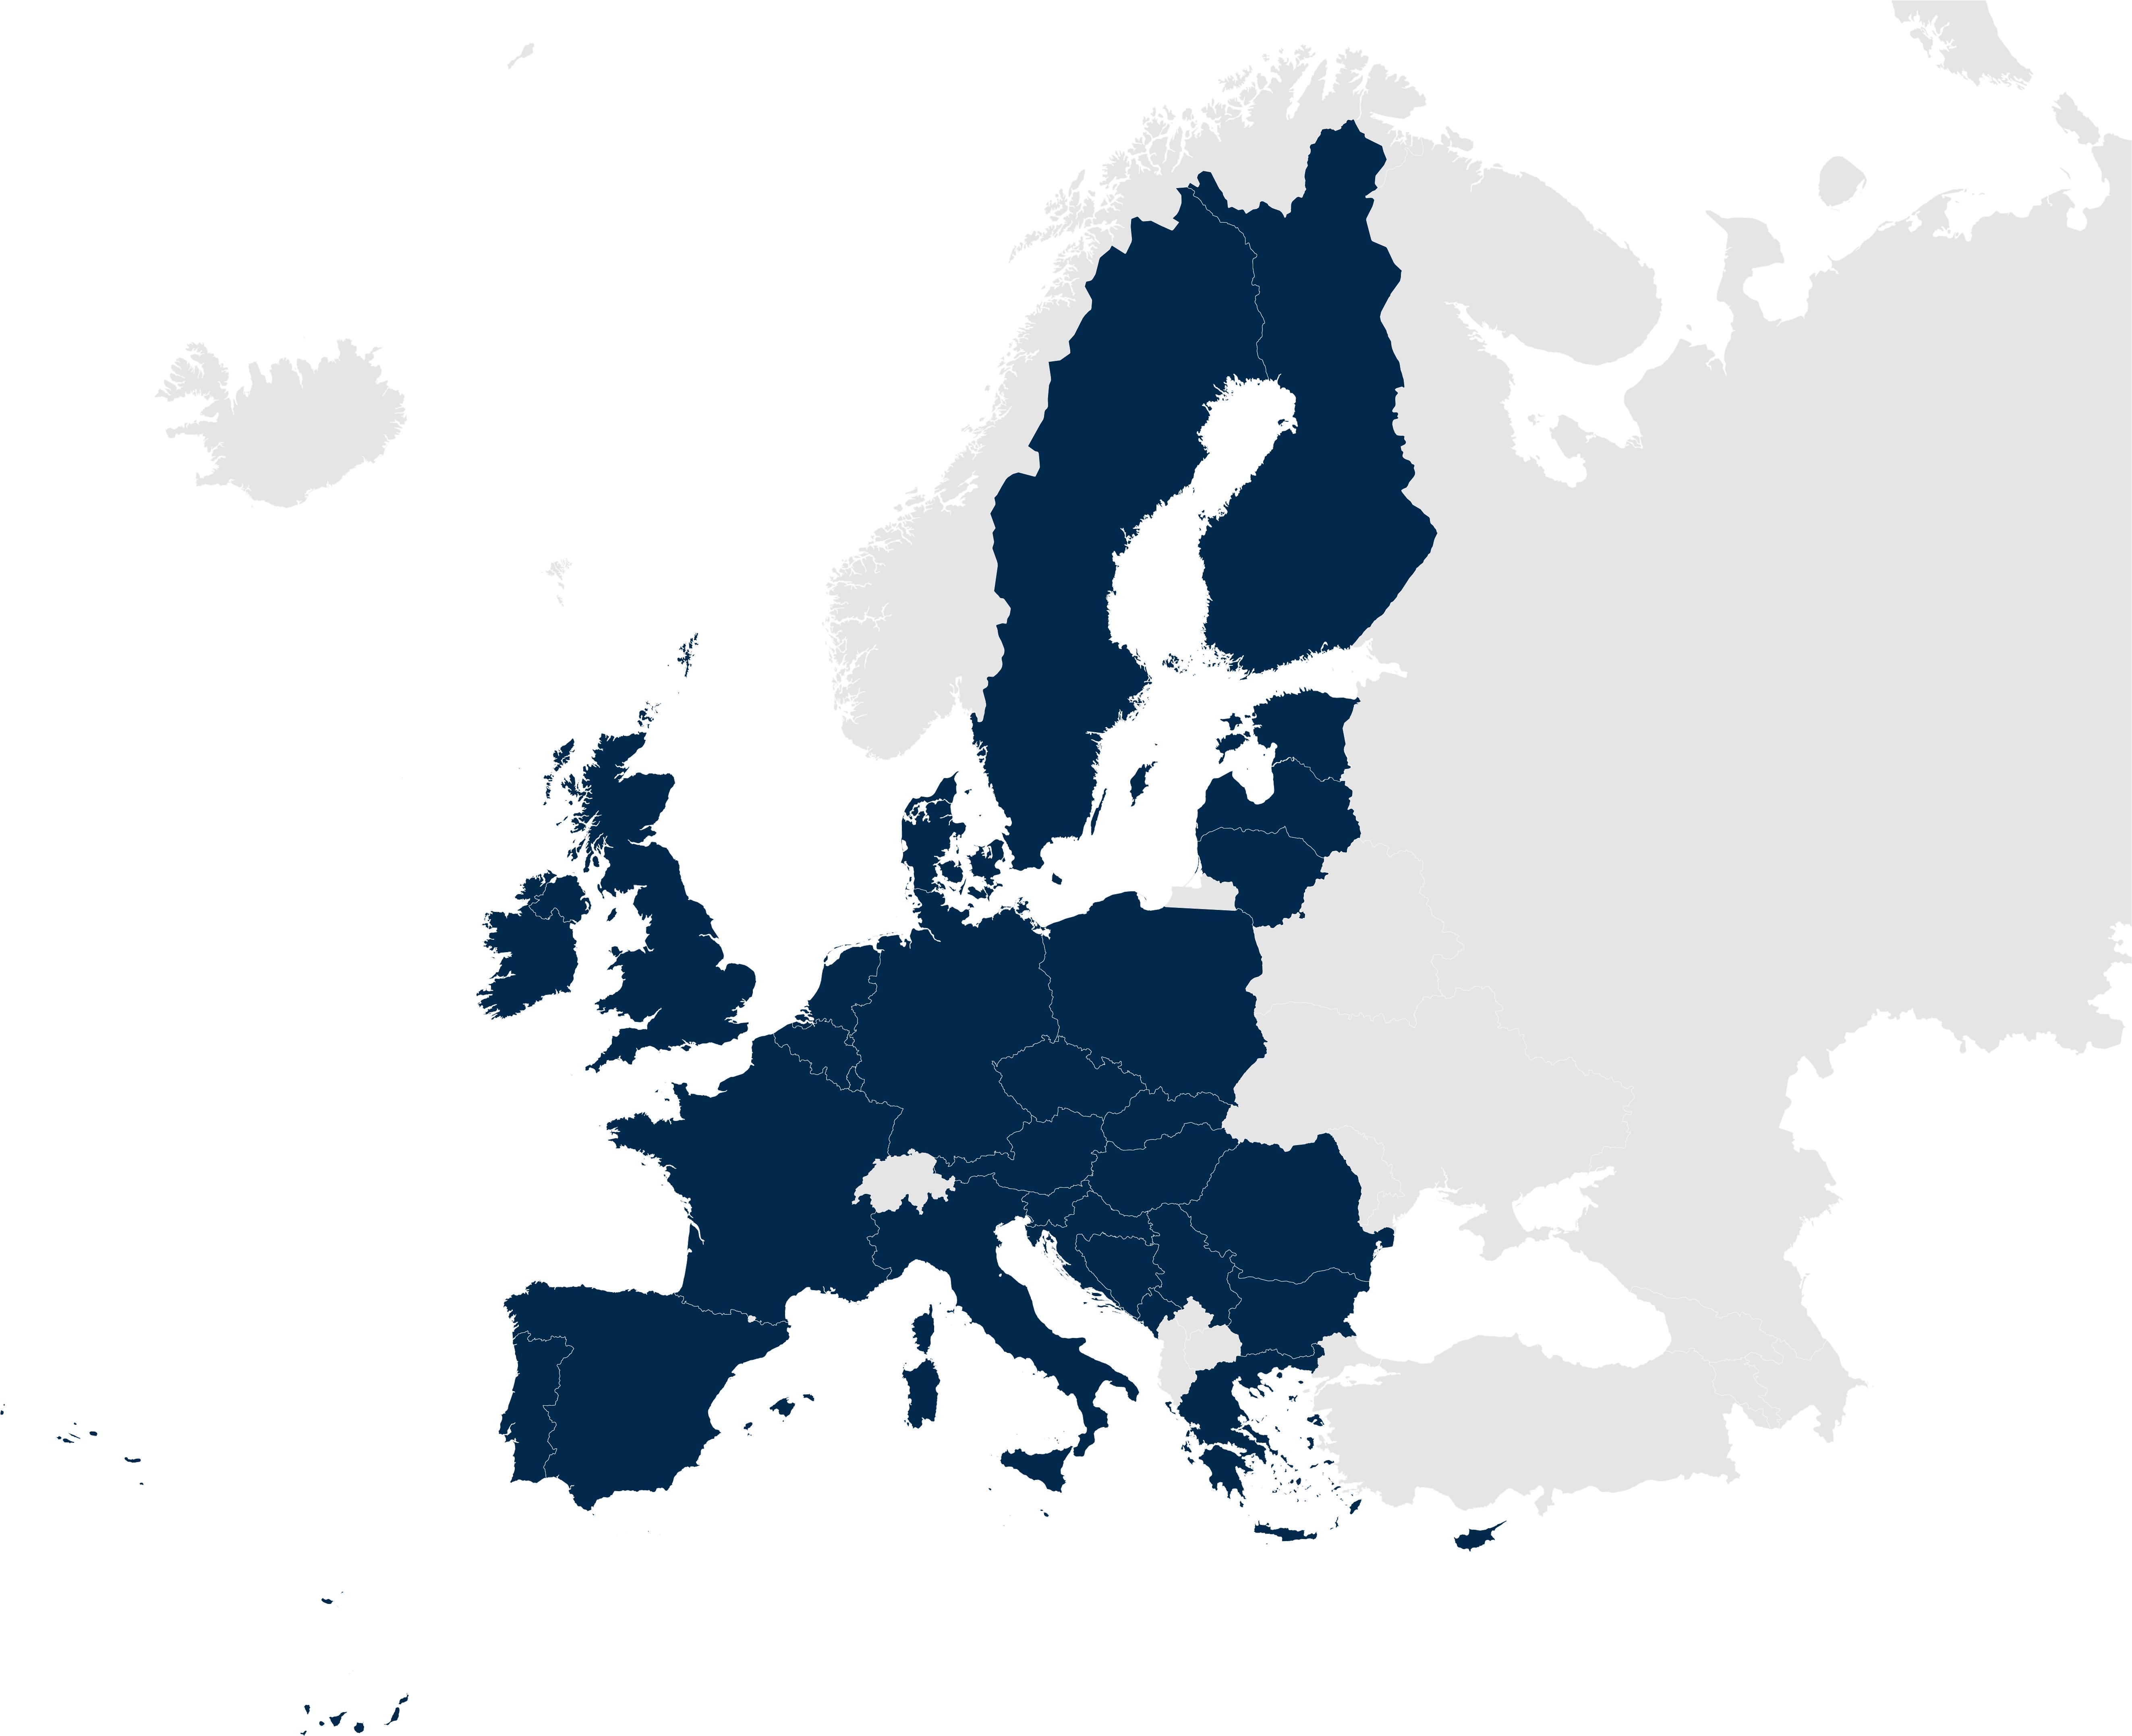 mapa besplatan roming mtel austrija